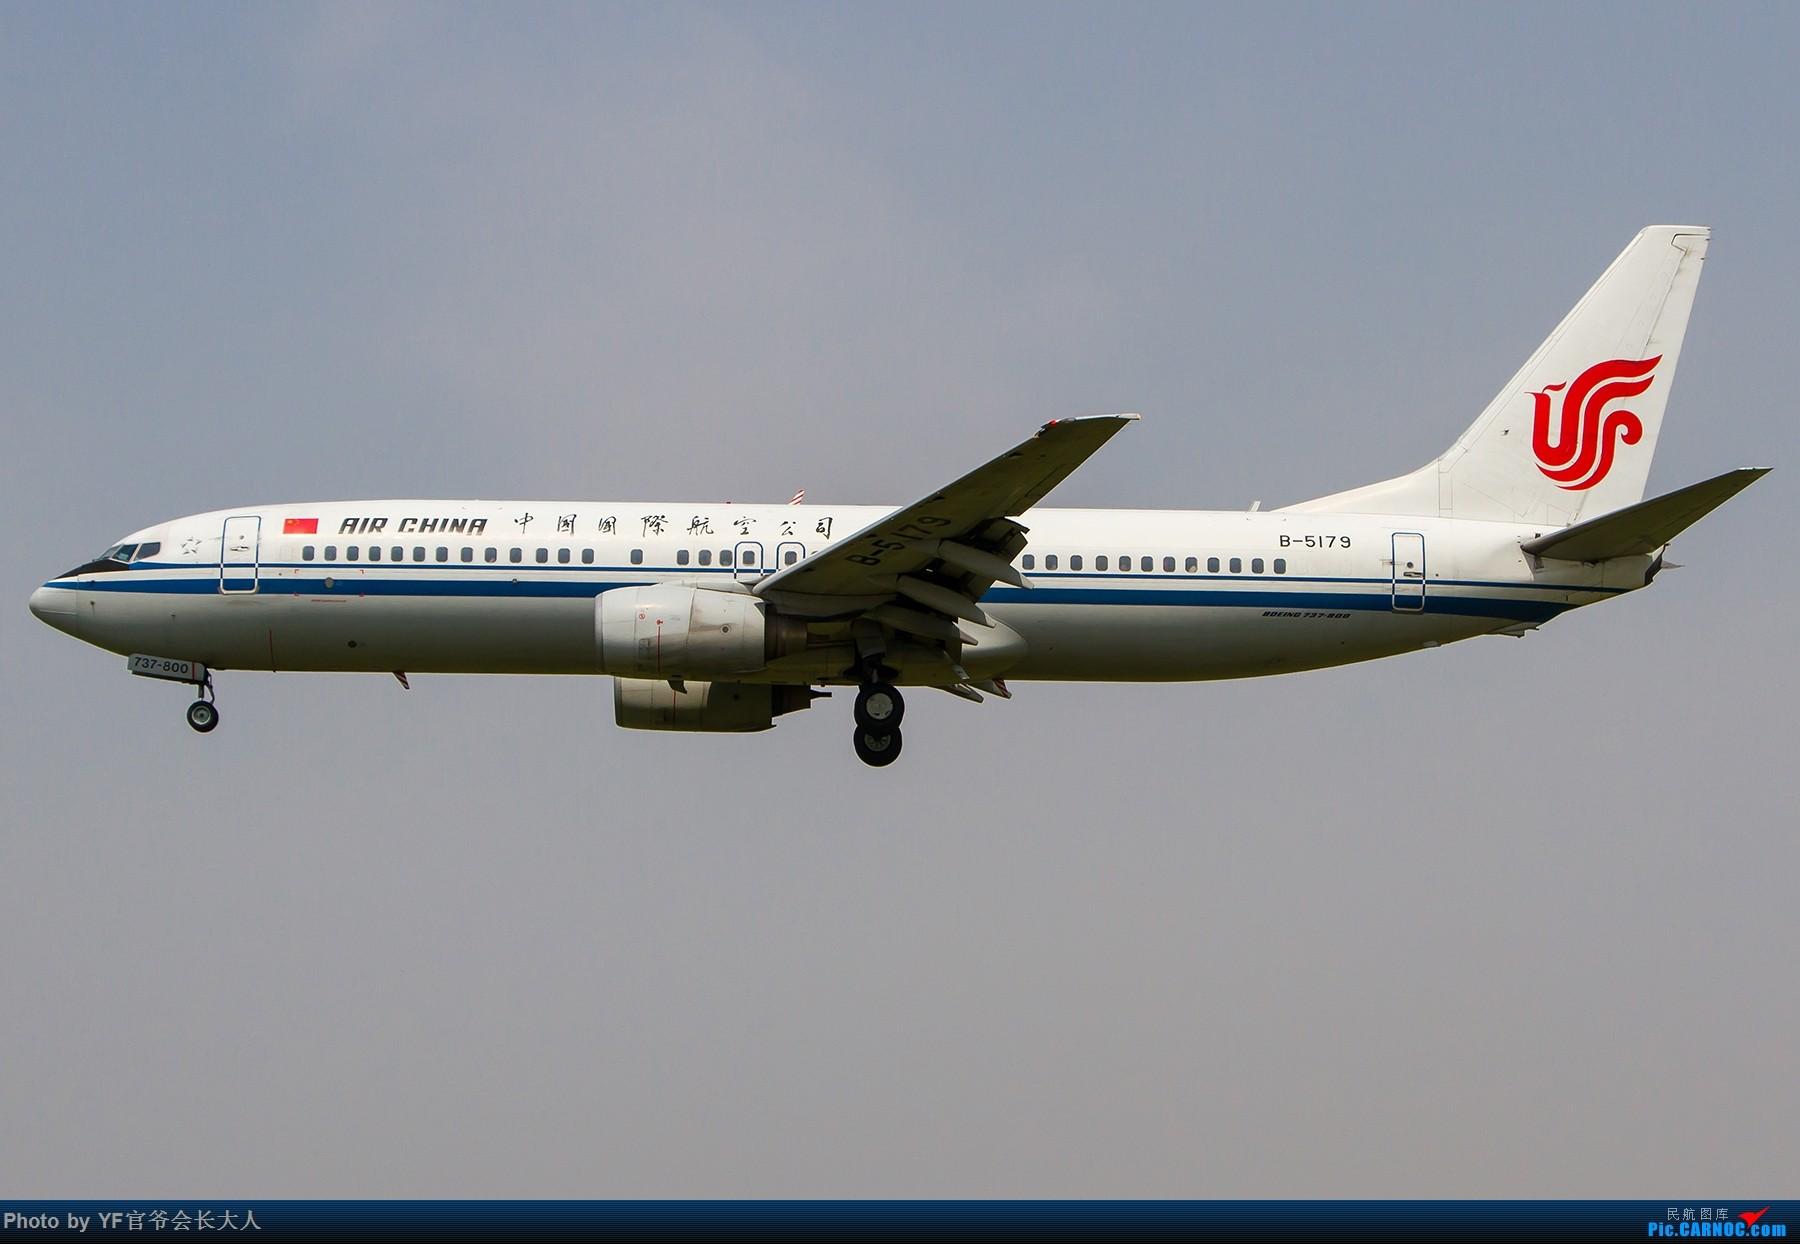 Re:[原创]【ZYTX】轻易不拍机,拍就要拍个过瘾!(新开的酷鸟,亚洲大西洋,顺带碰上朝韩两国的好货) BOEING 737-800 B-5179 中国沈阳桃仙国际机场